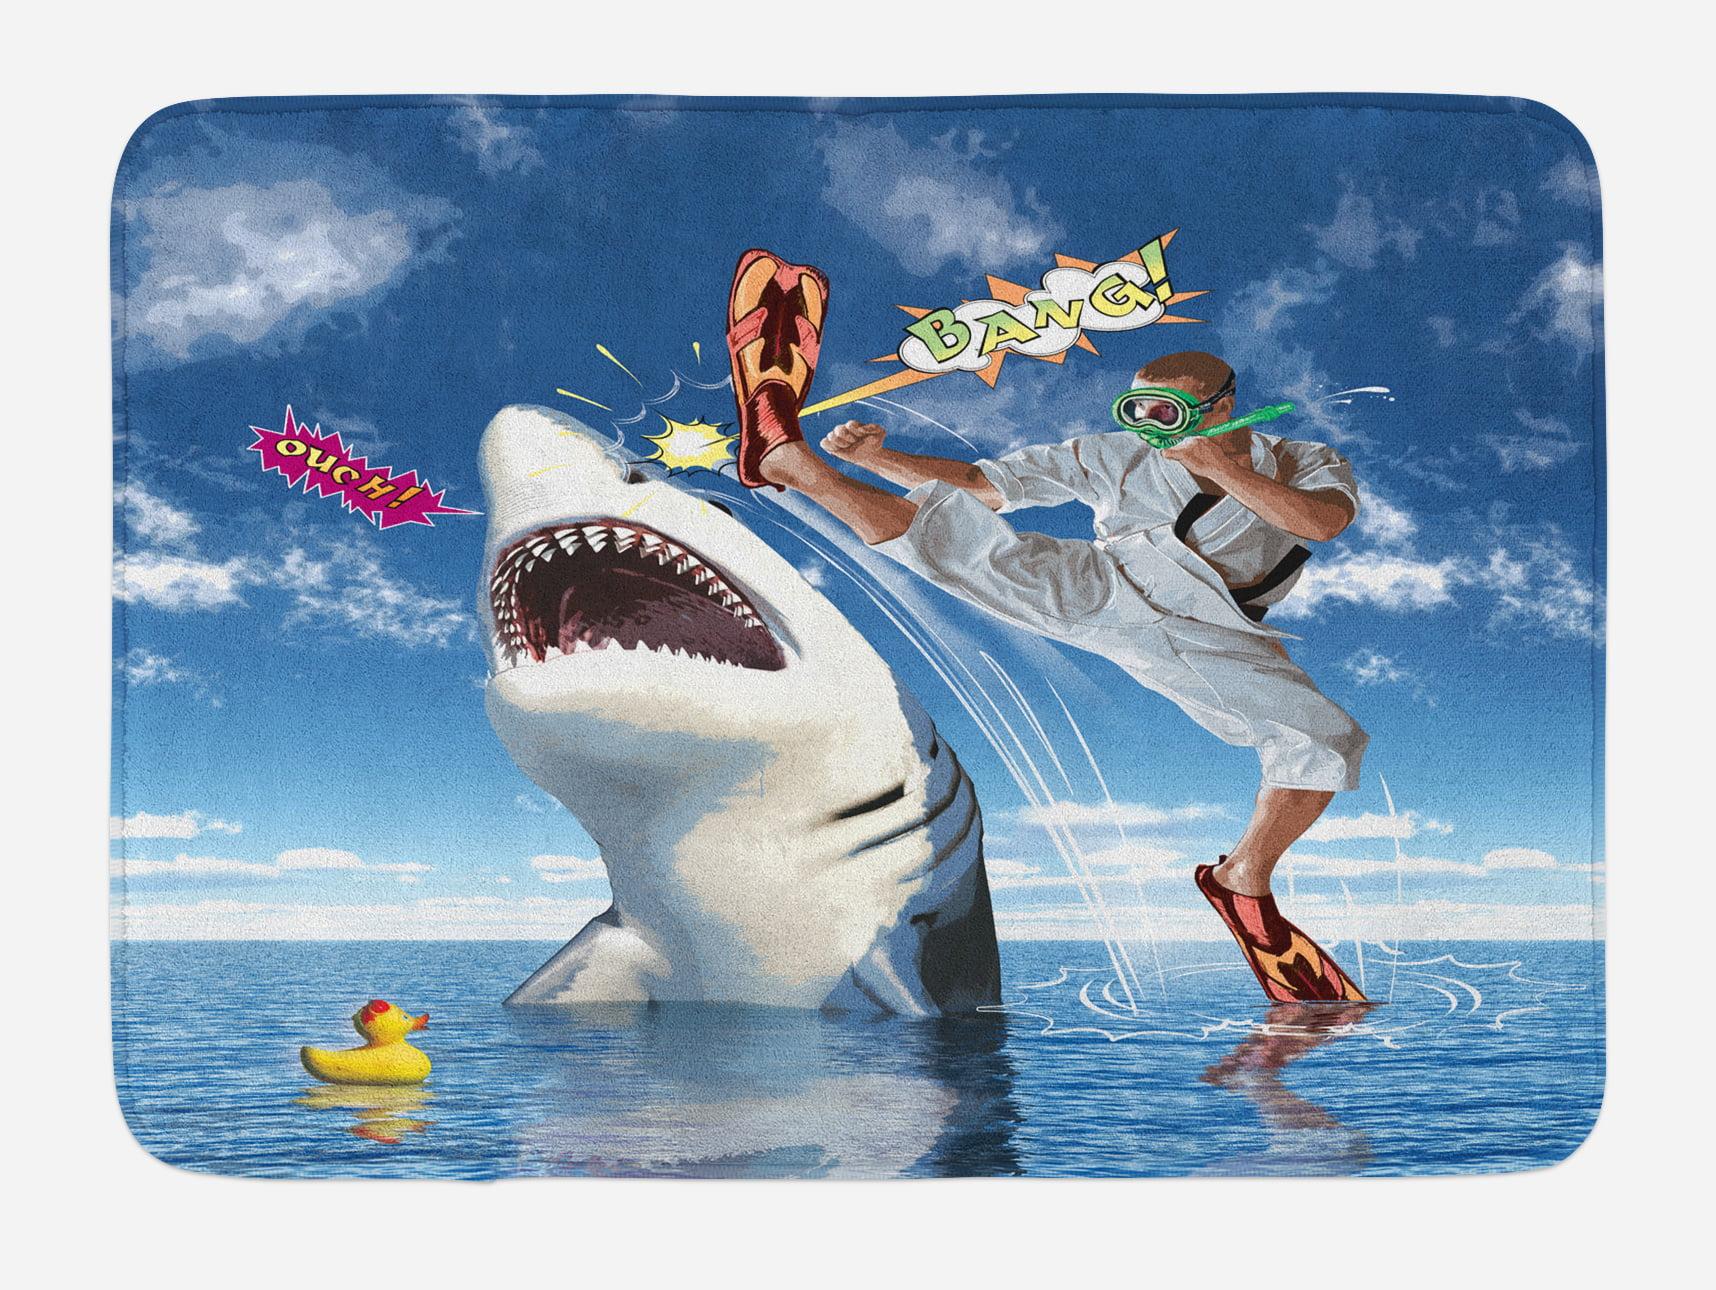 Sealife Bath Mat, Unusual Marine Navy Life Animals Fish Sharks with Karate Kid and Comics... by 3decor llc